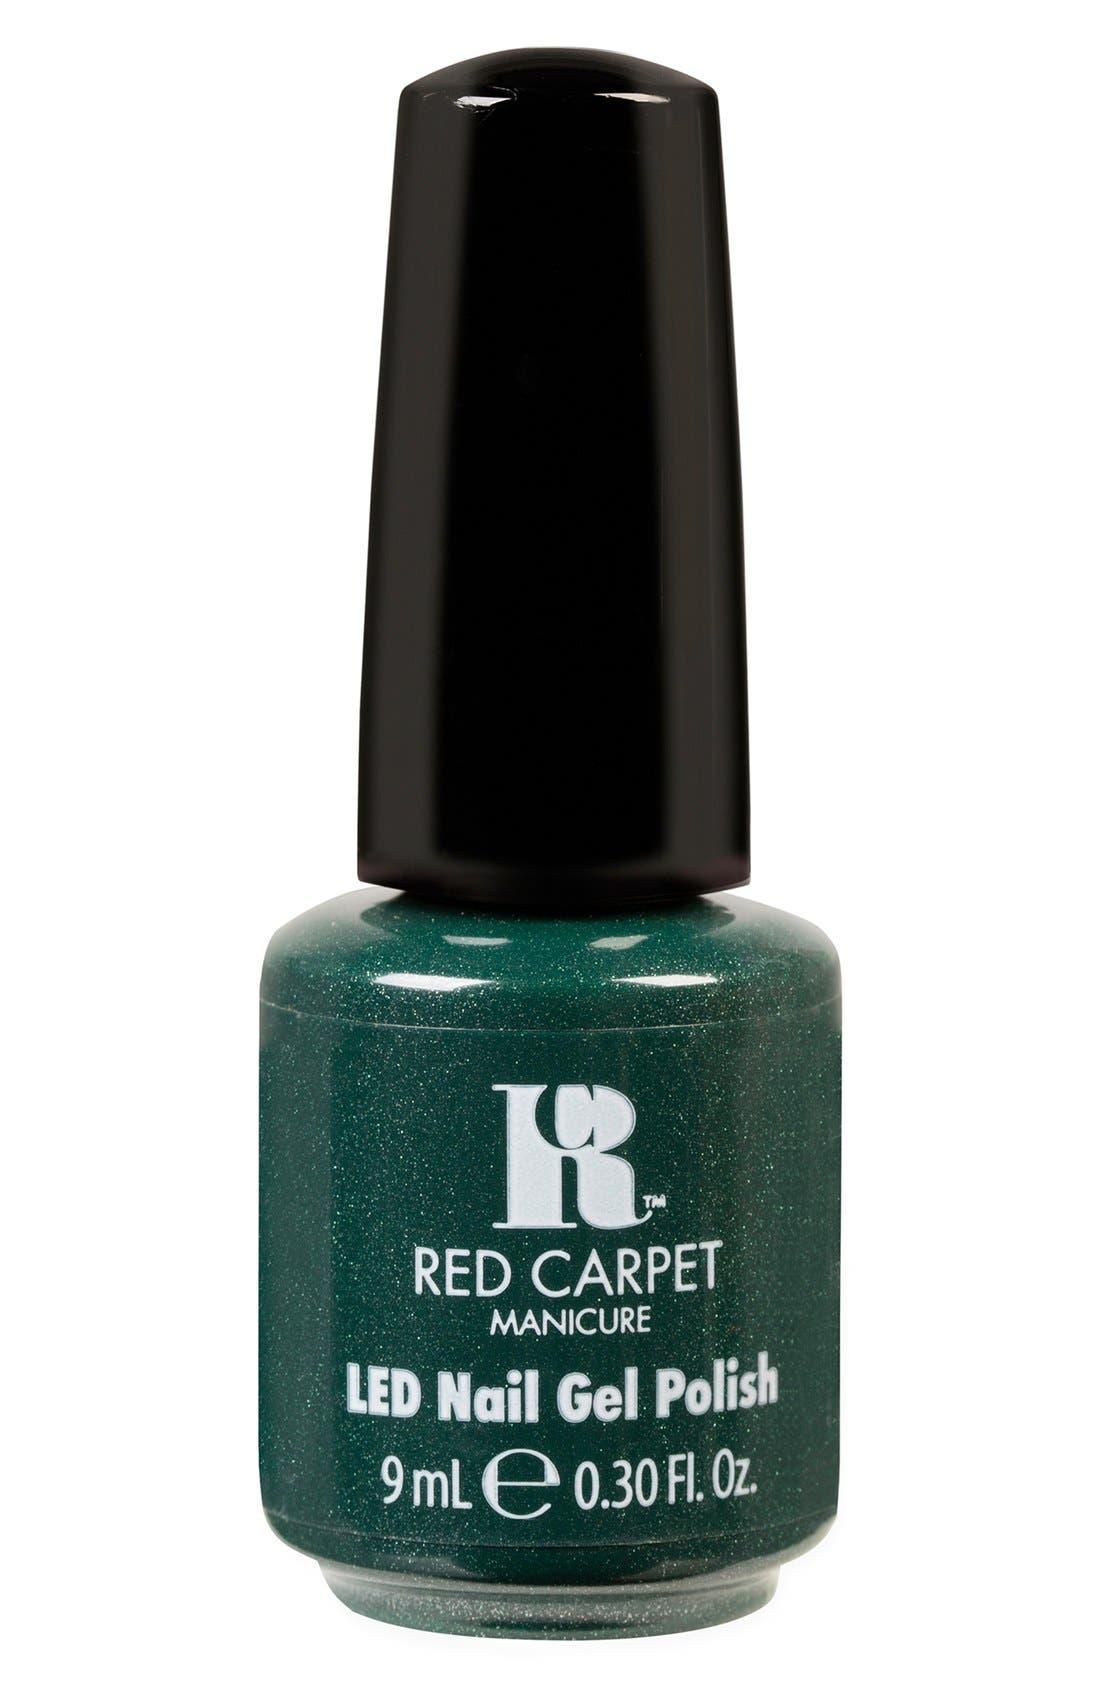 Red Carpet Manicure LED Nail Gel Polish